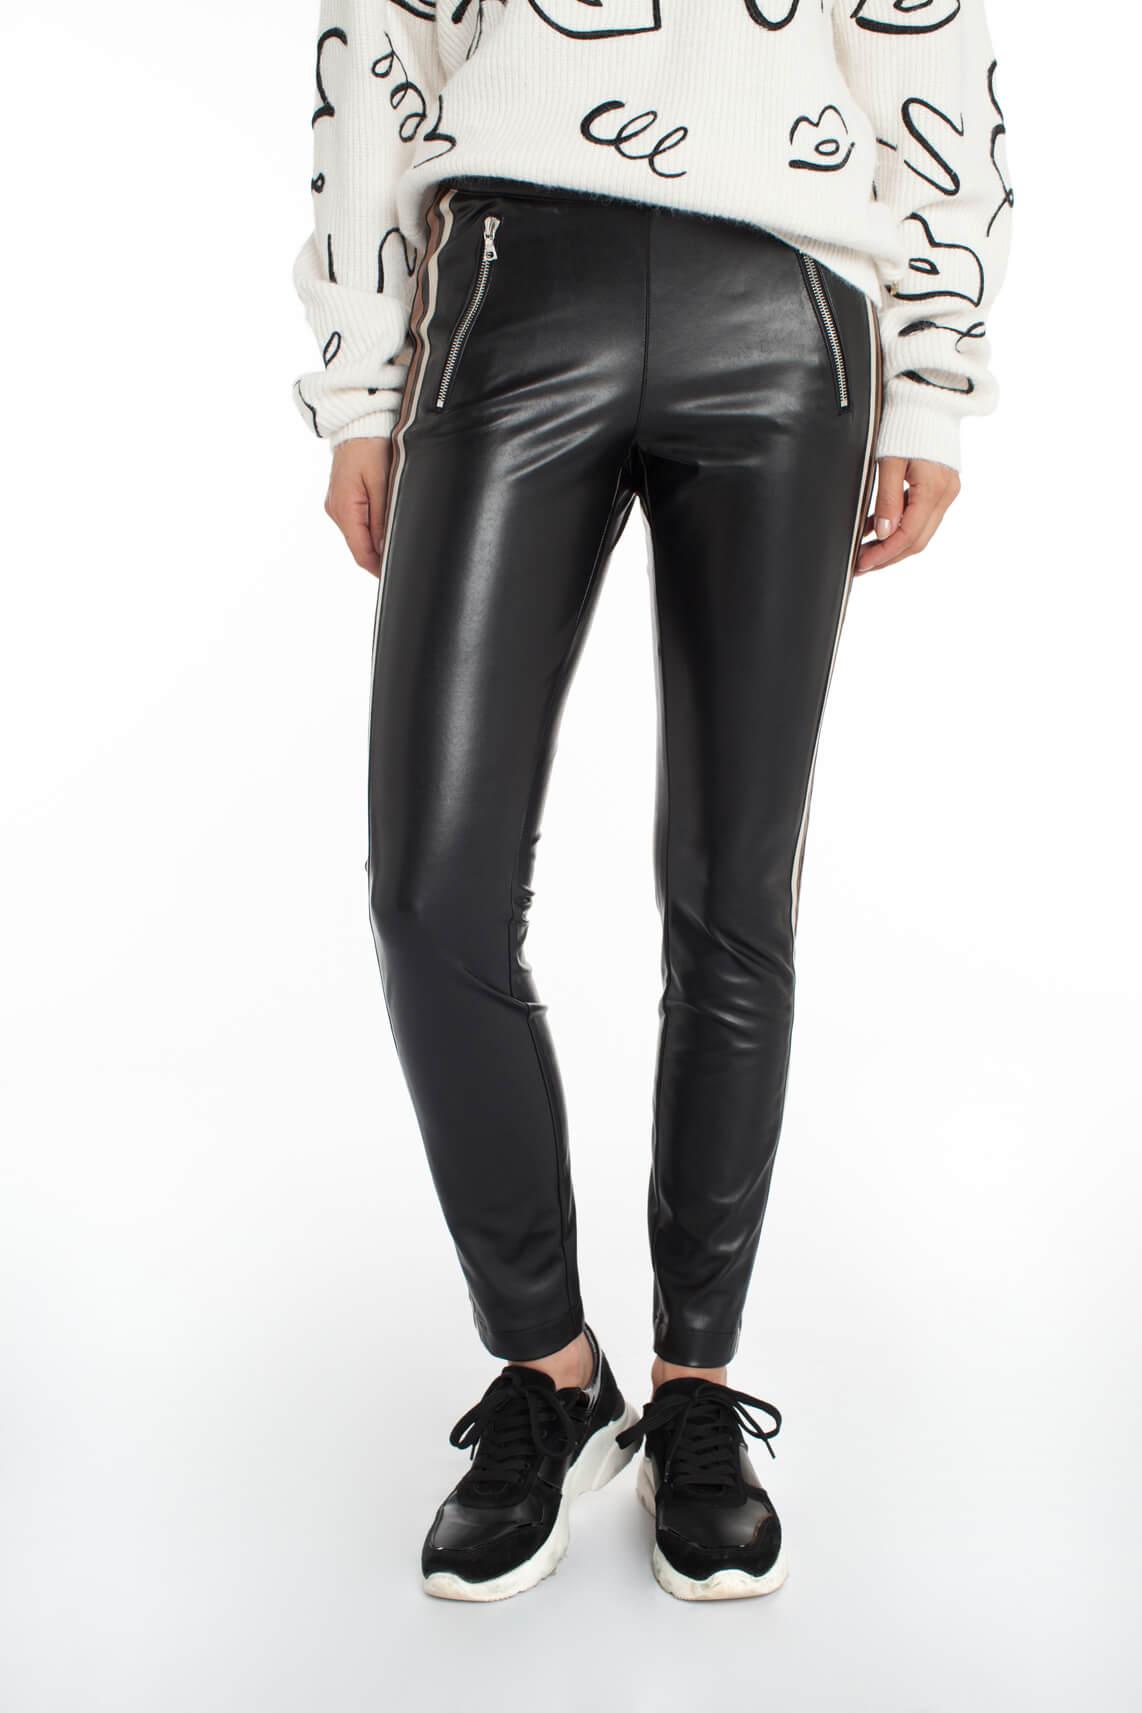 Cambio Dames Ray fake leather tregging zwart